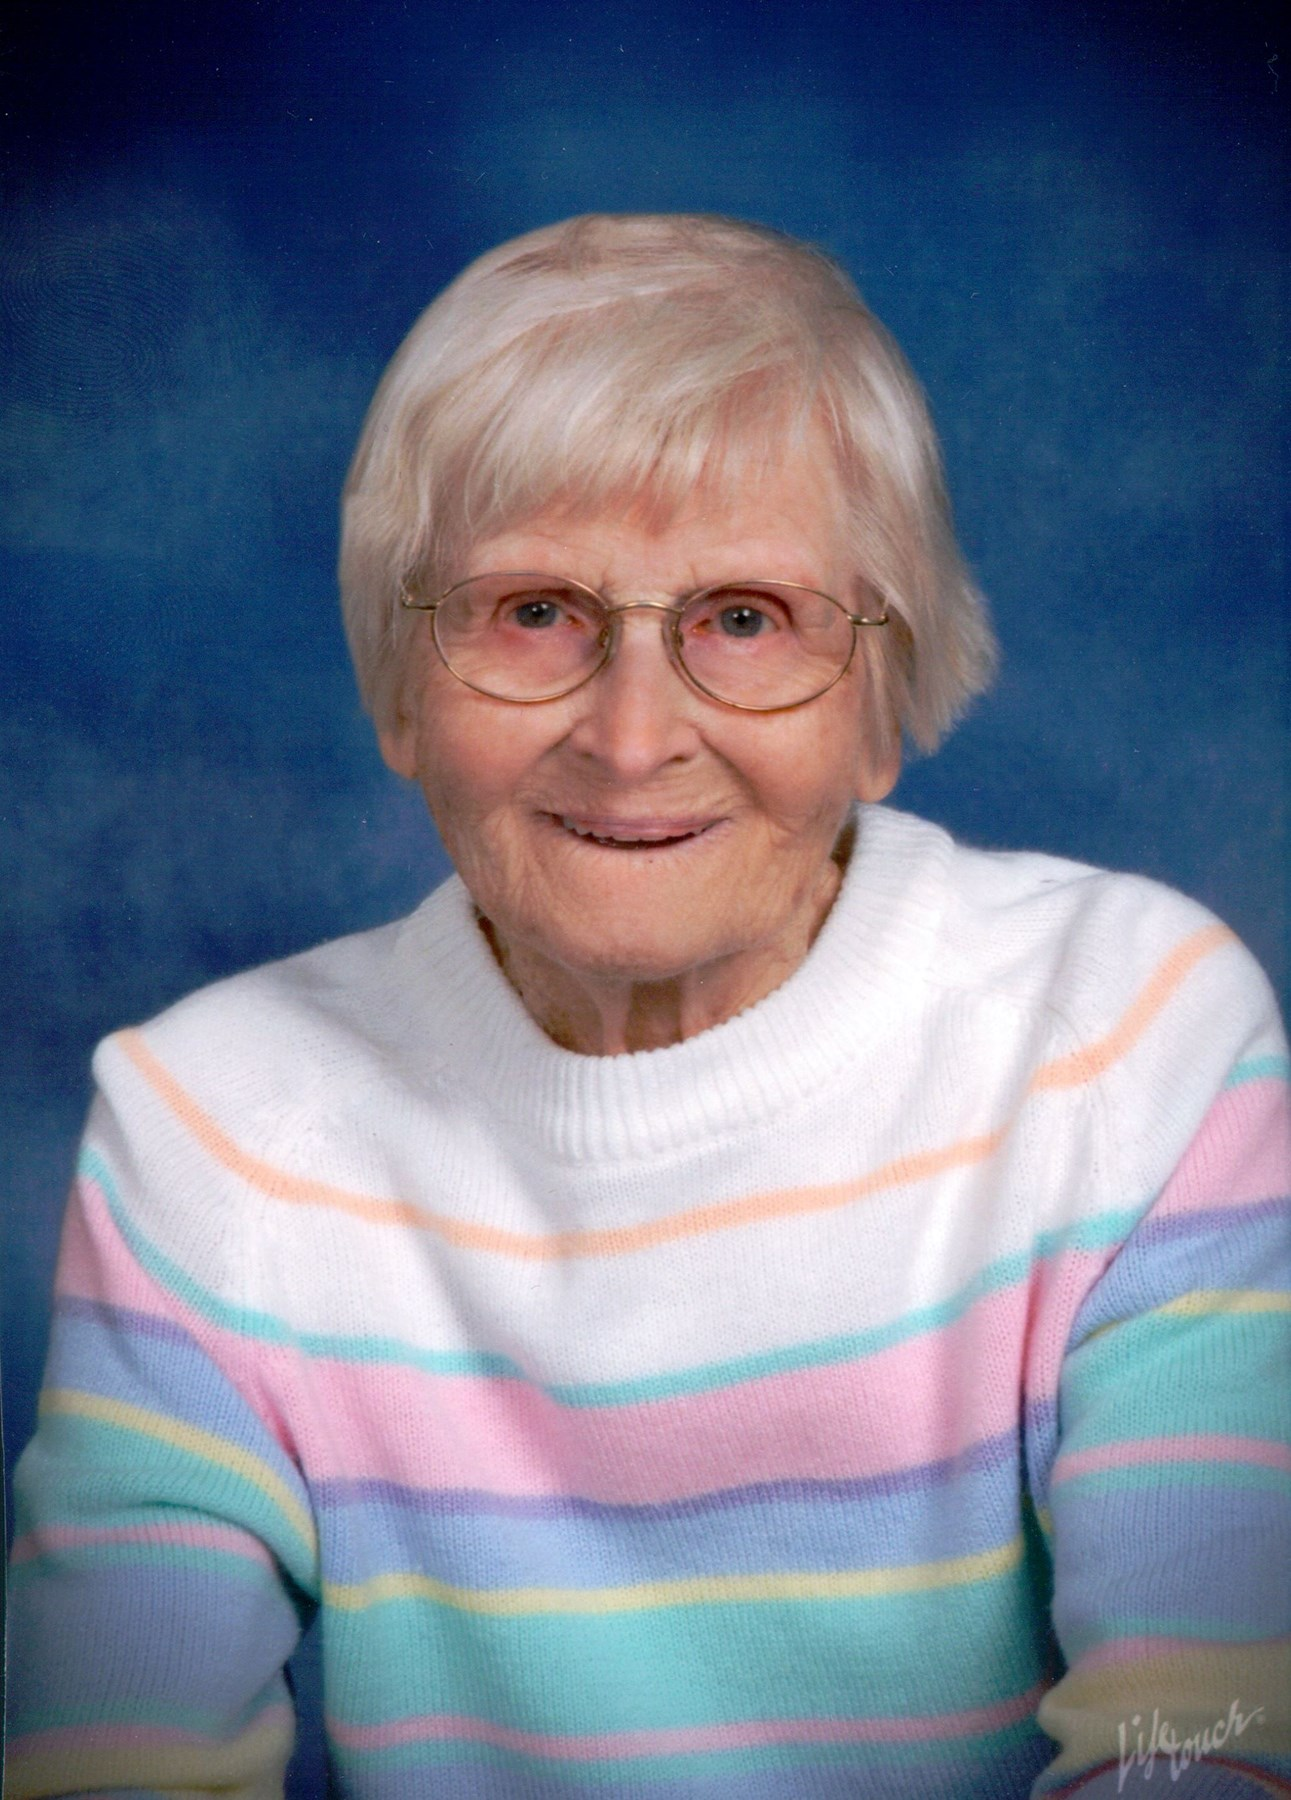 Communication on this topic: Connie Sawyer, margaret-christensen/